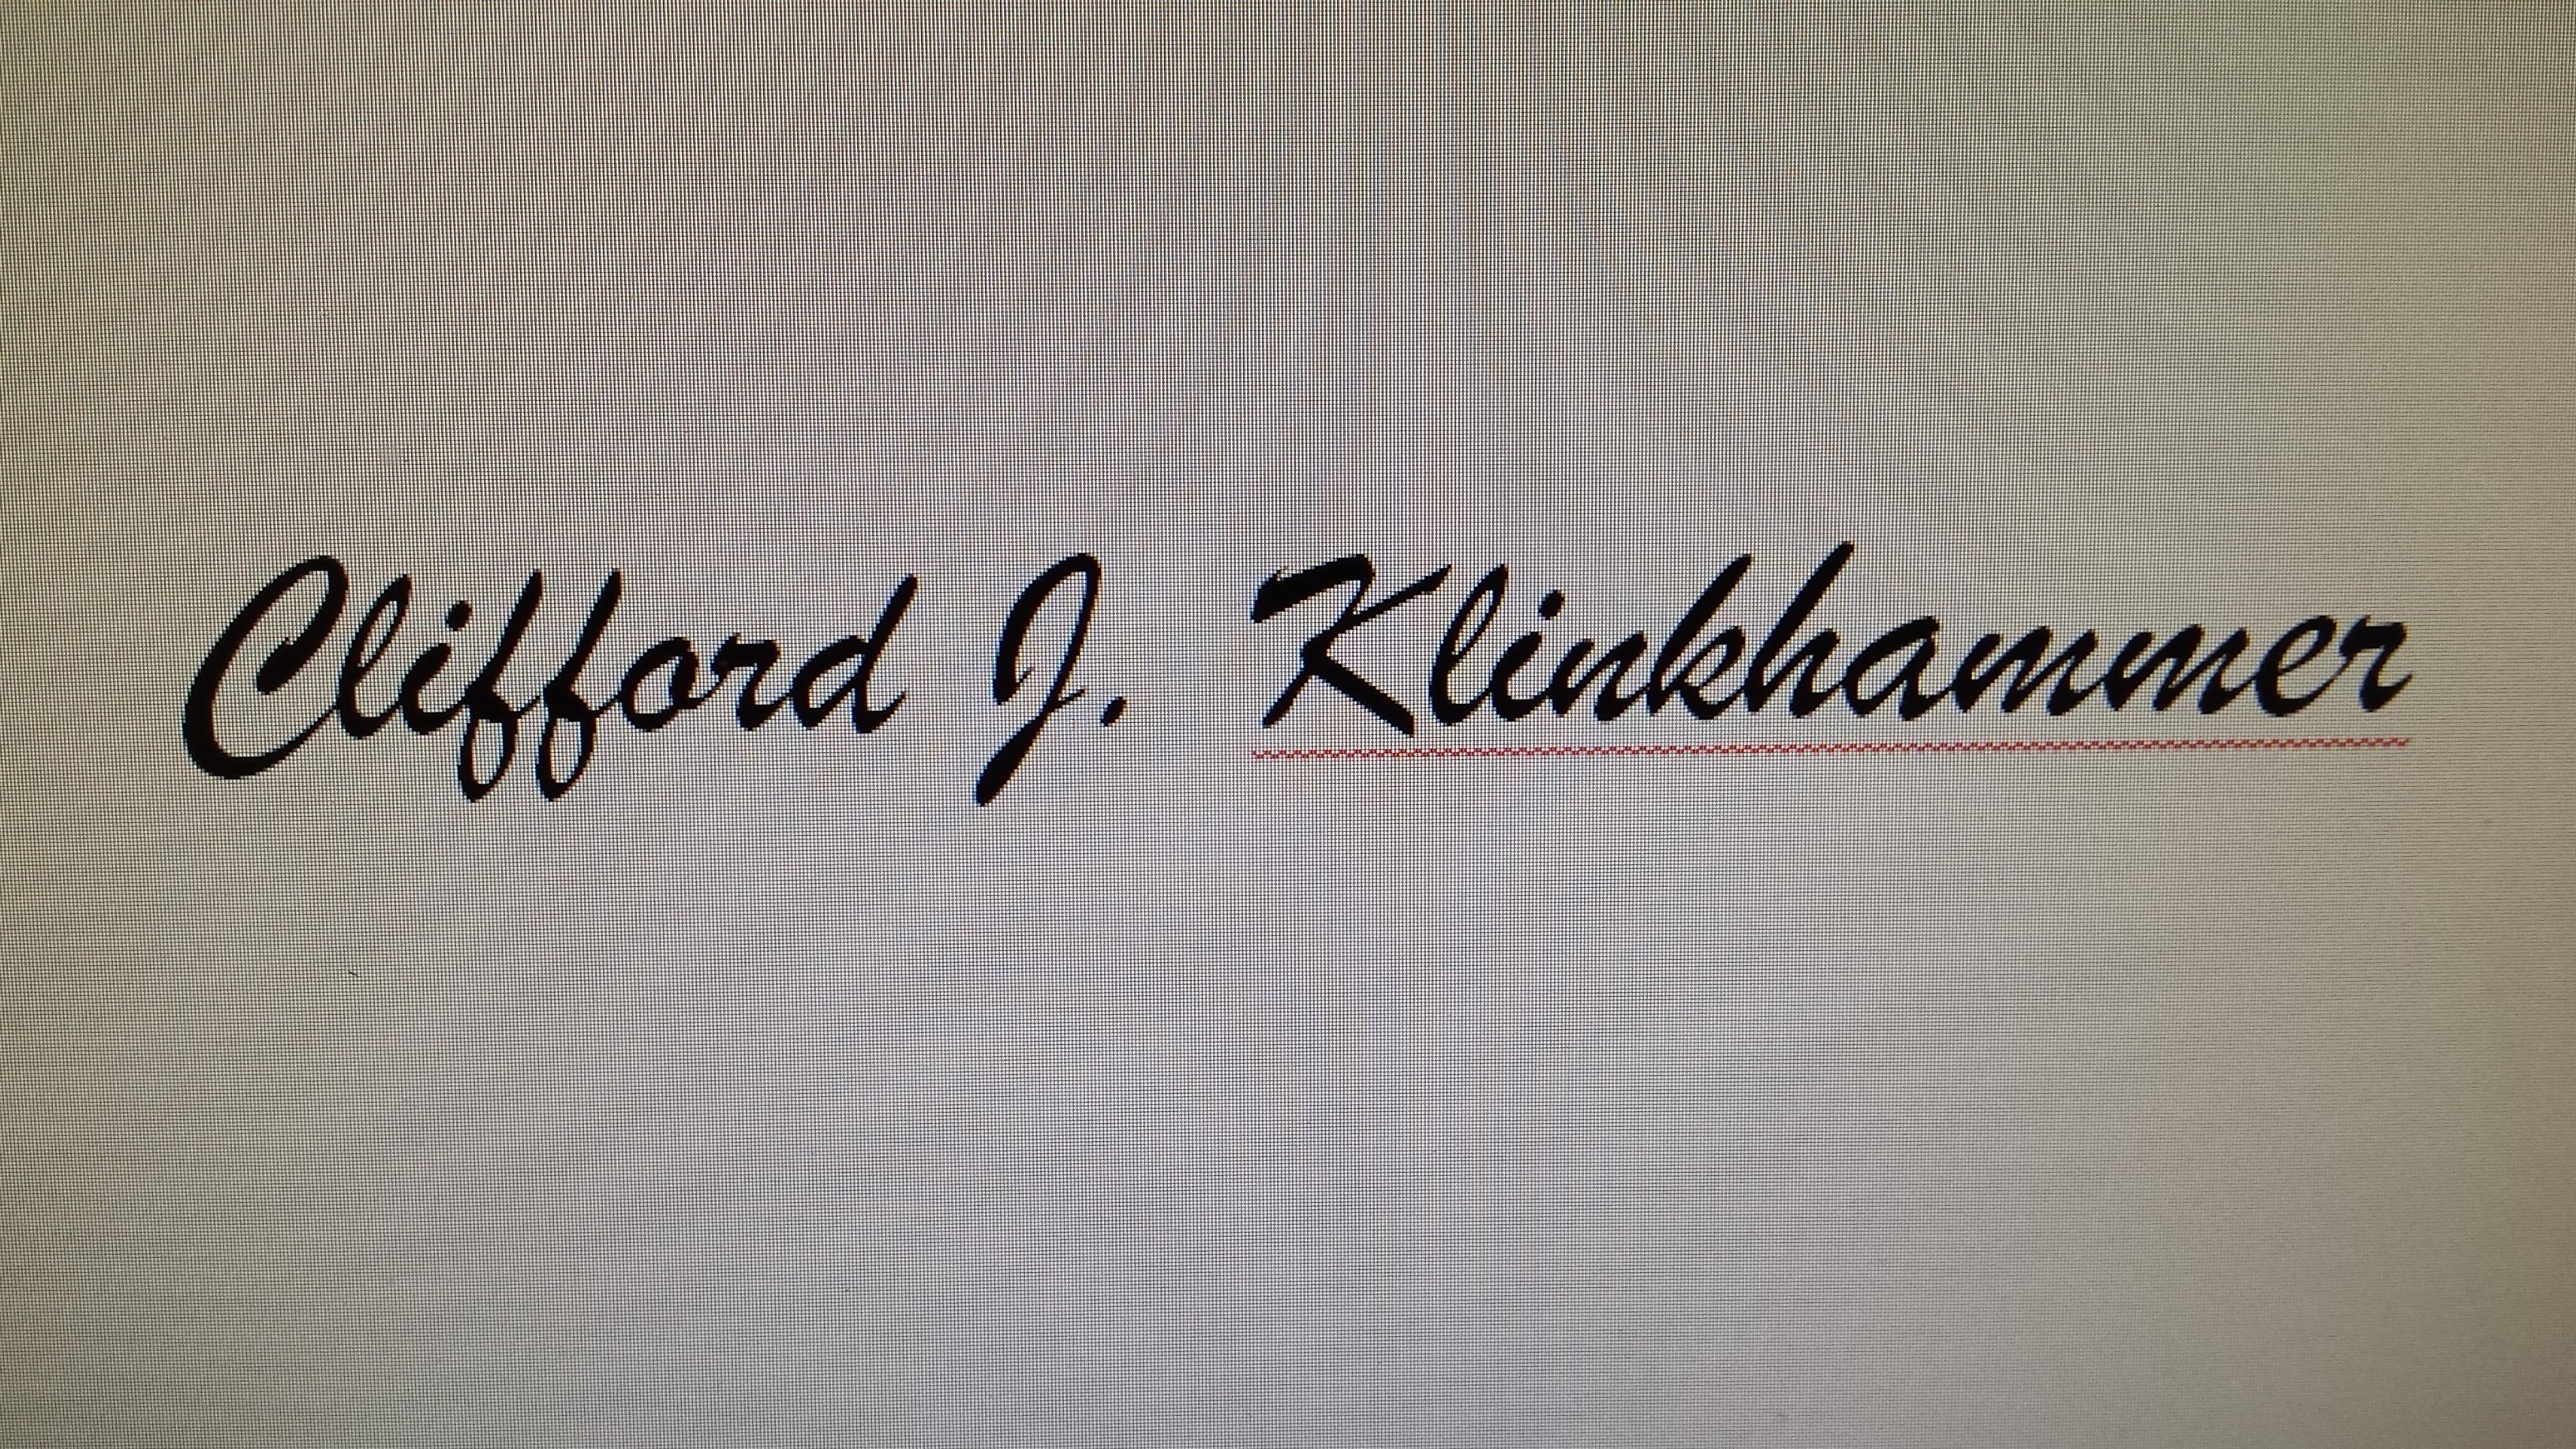 Clifford J. Klinkhammer Signature